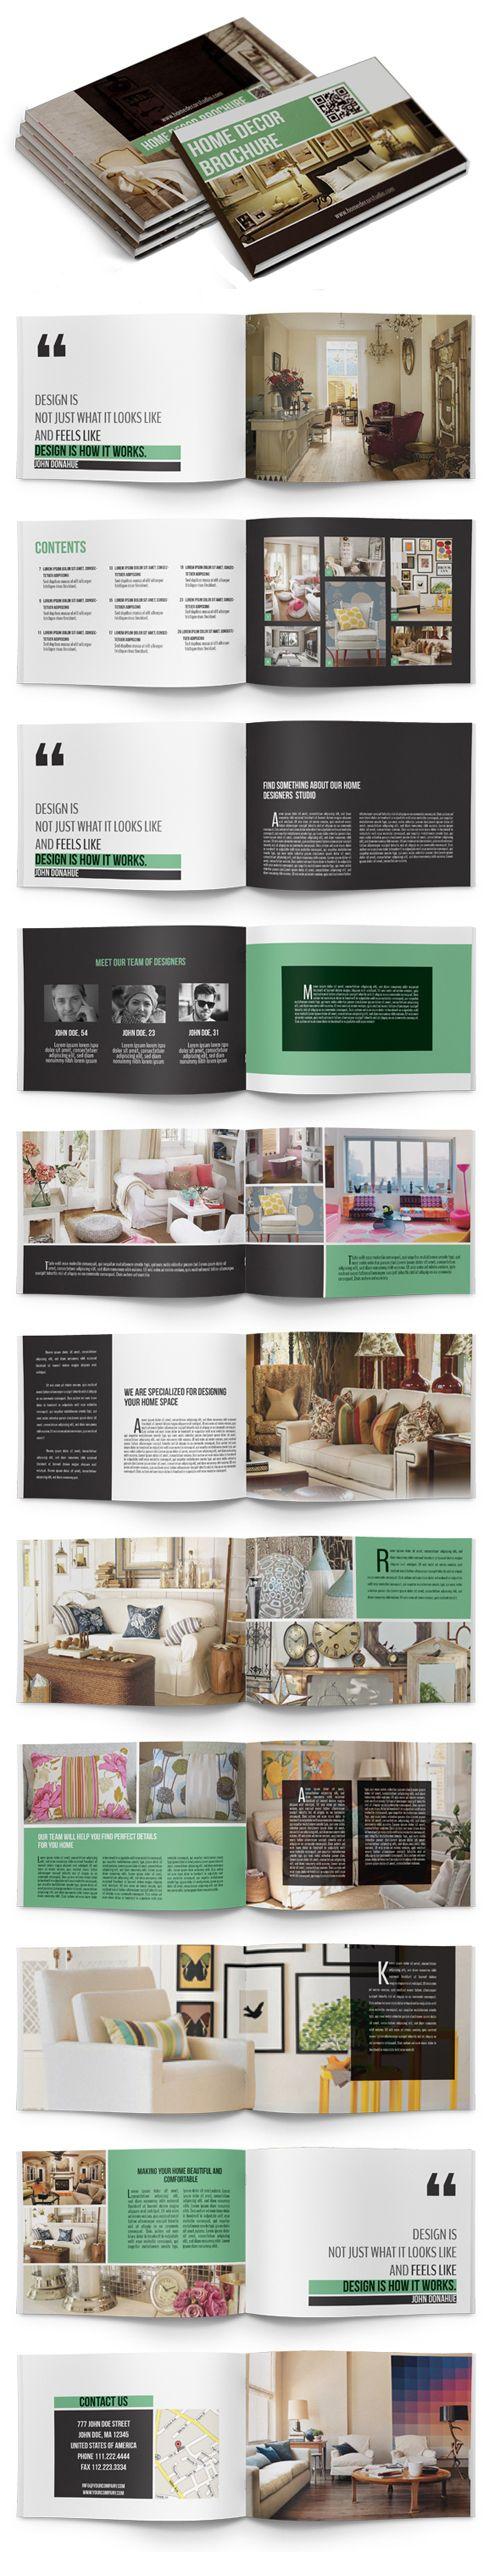 Home Decor Brochure